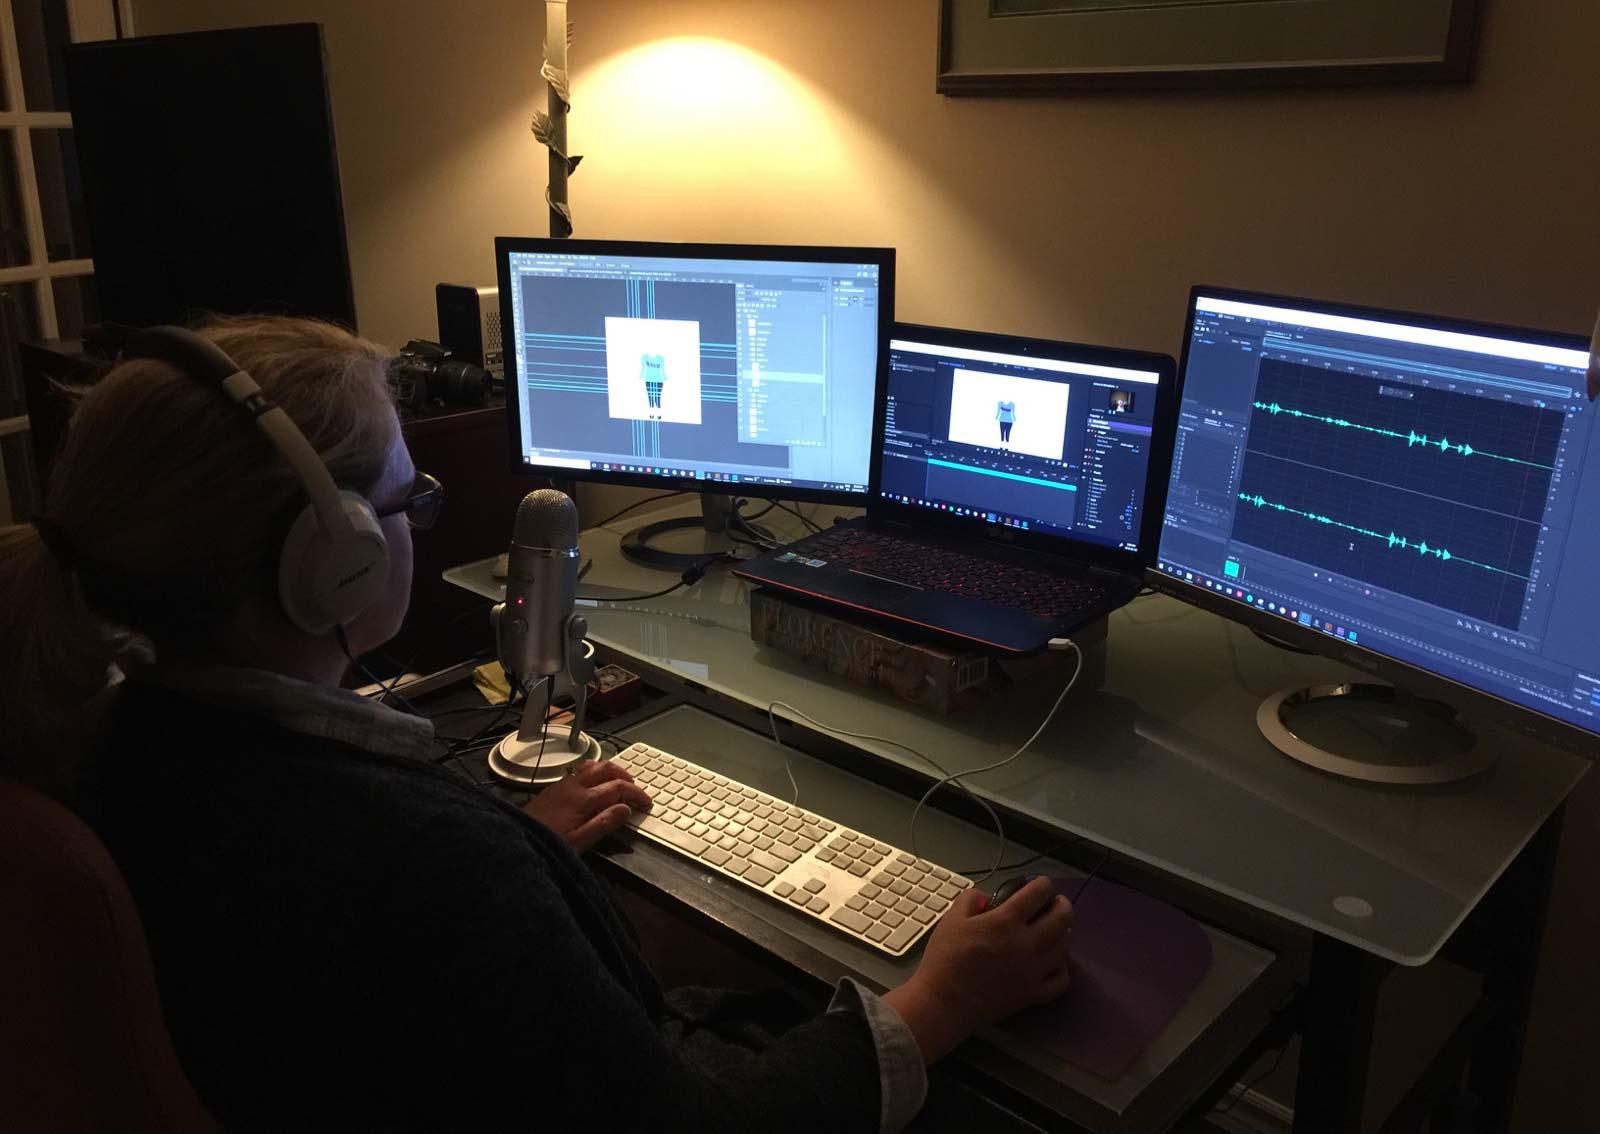 Sharon video editing